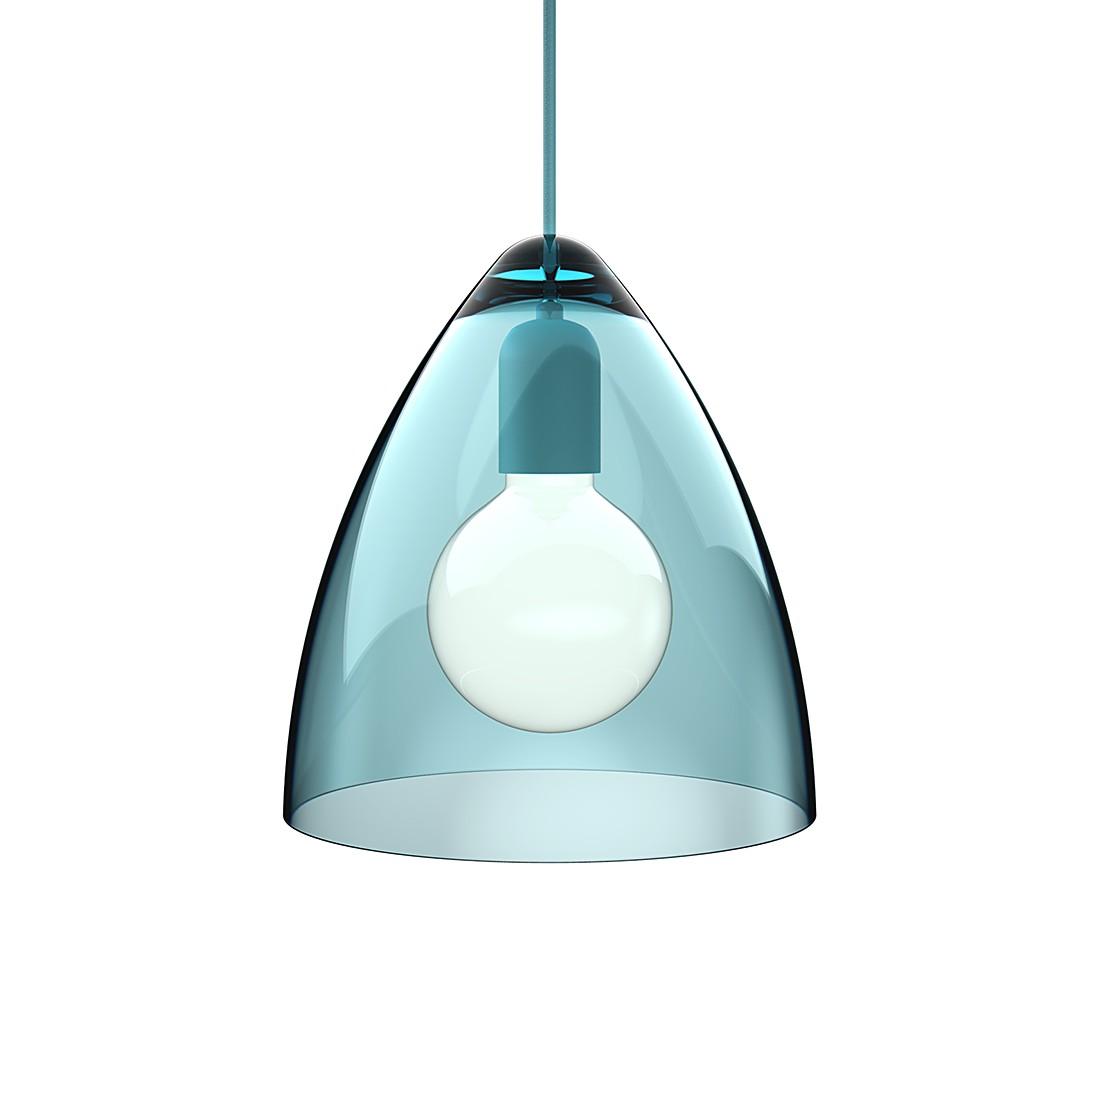 Pendelleuchte Funk ● Acrylglas/Textil ● Transparent Türkis/Türkis ● Durchmesser 22 cm- Nordlux A++